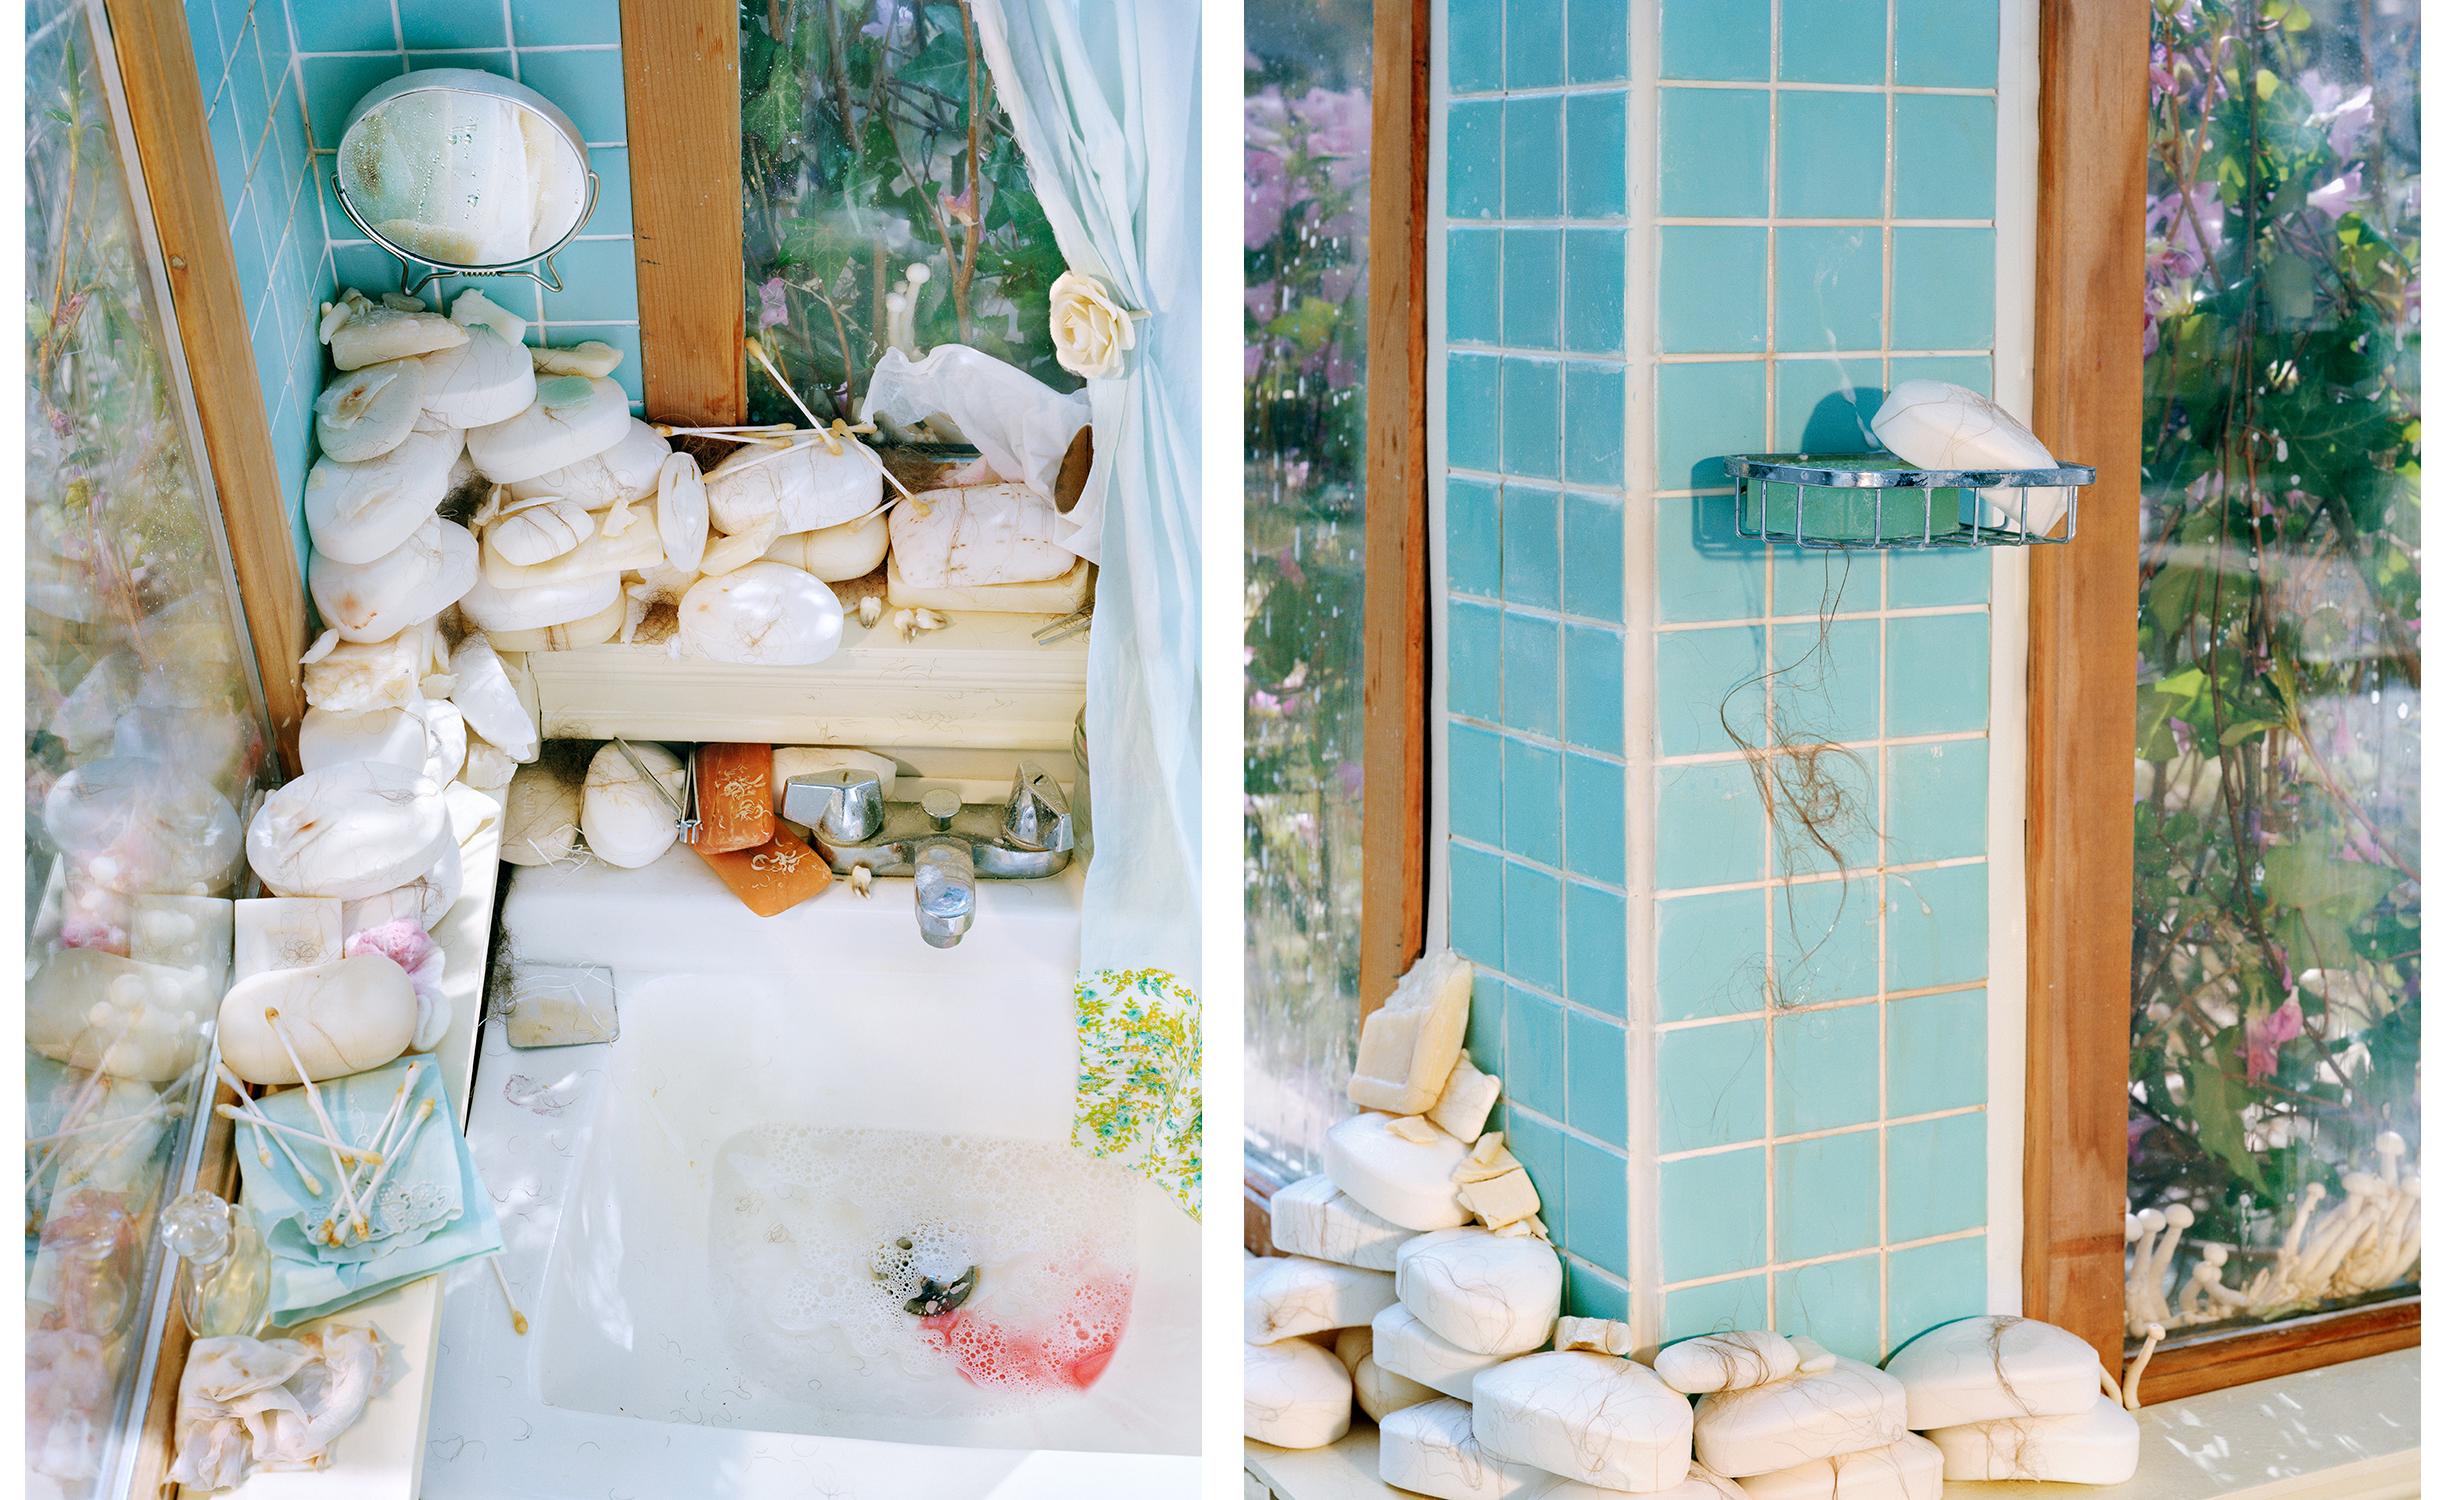 Vivarium_Bathroom_Diptych.jpg